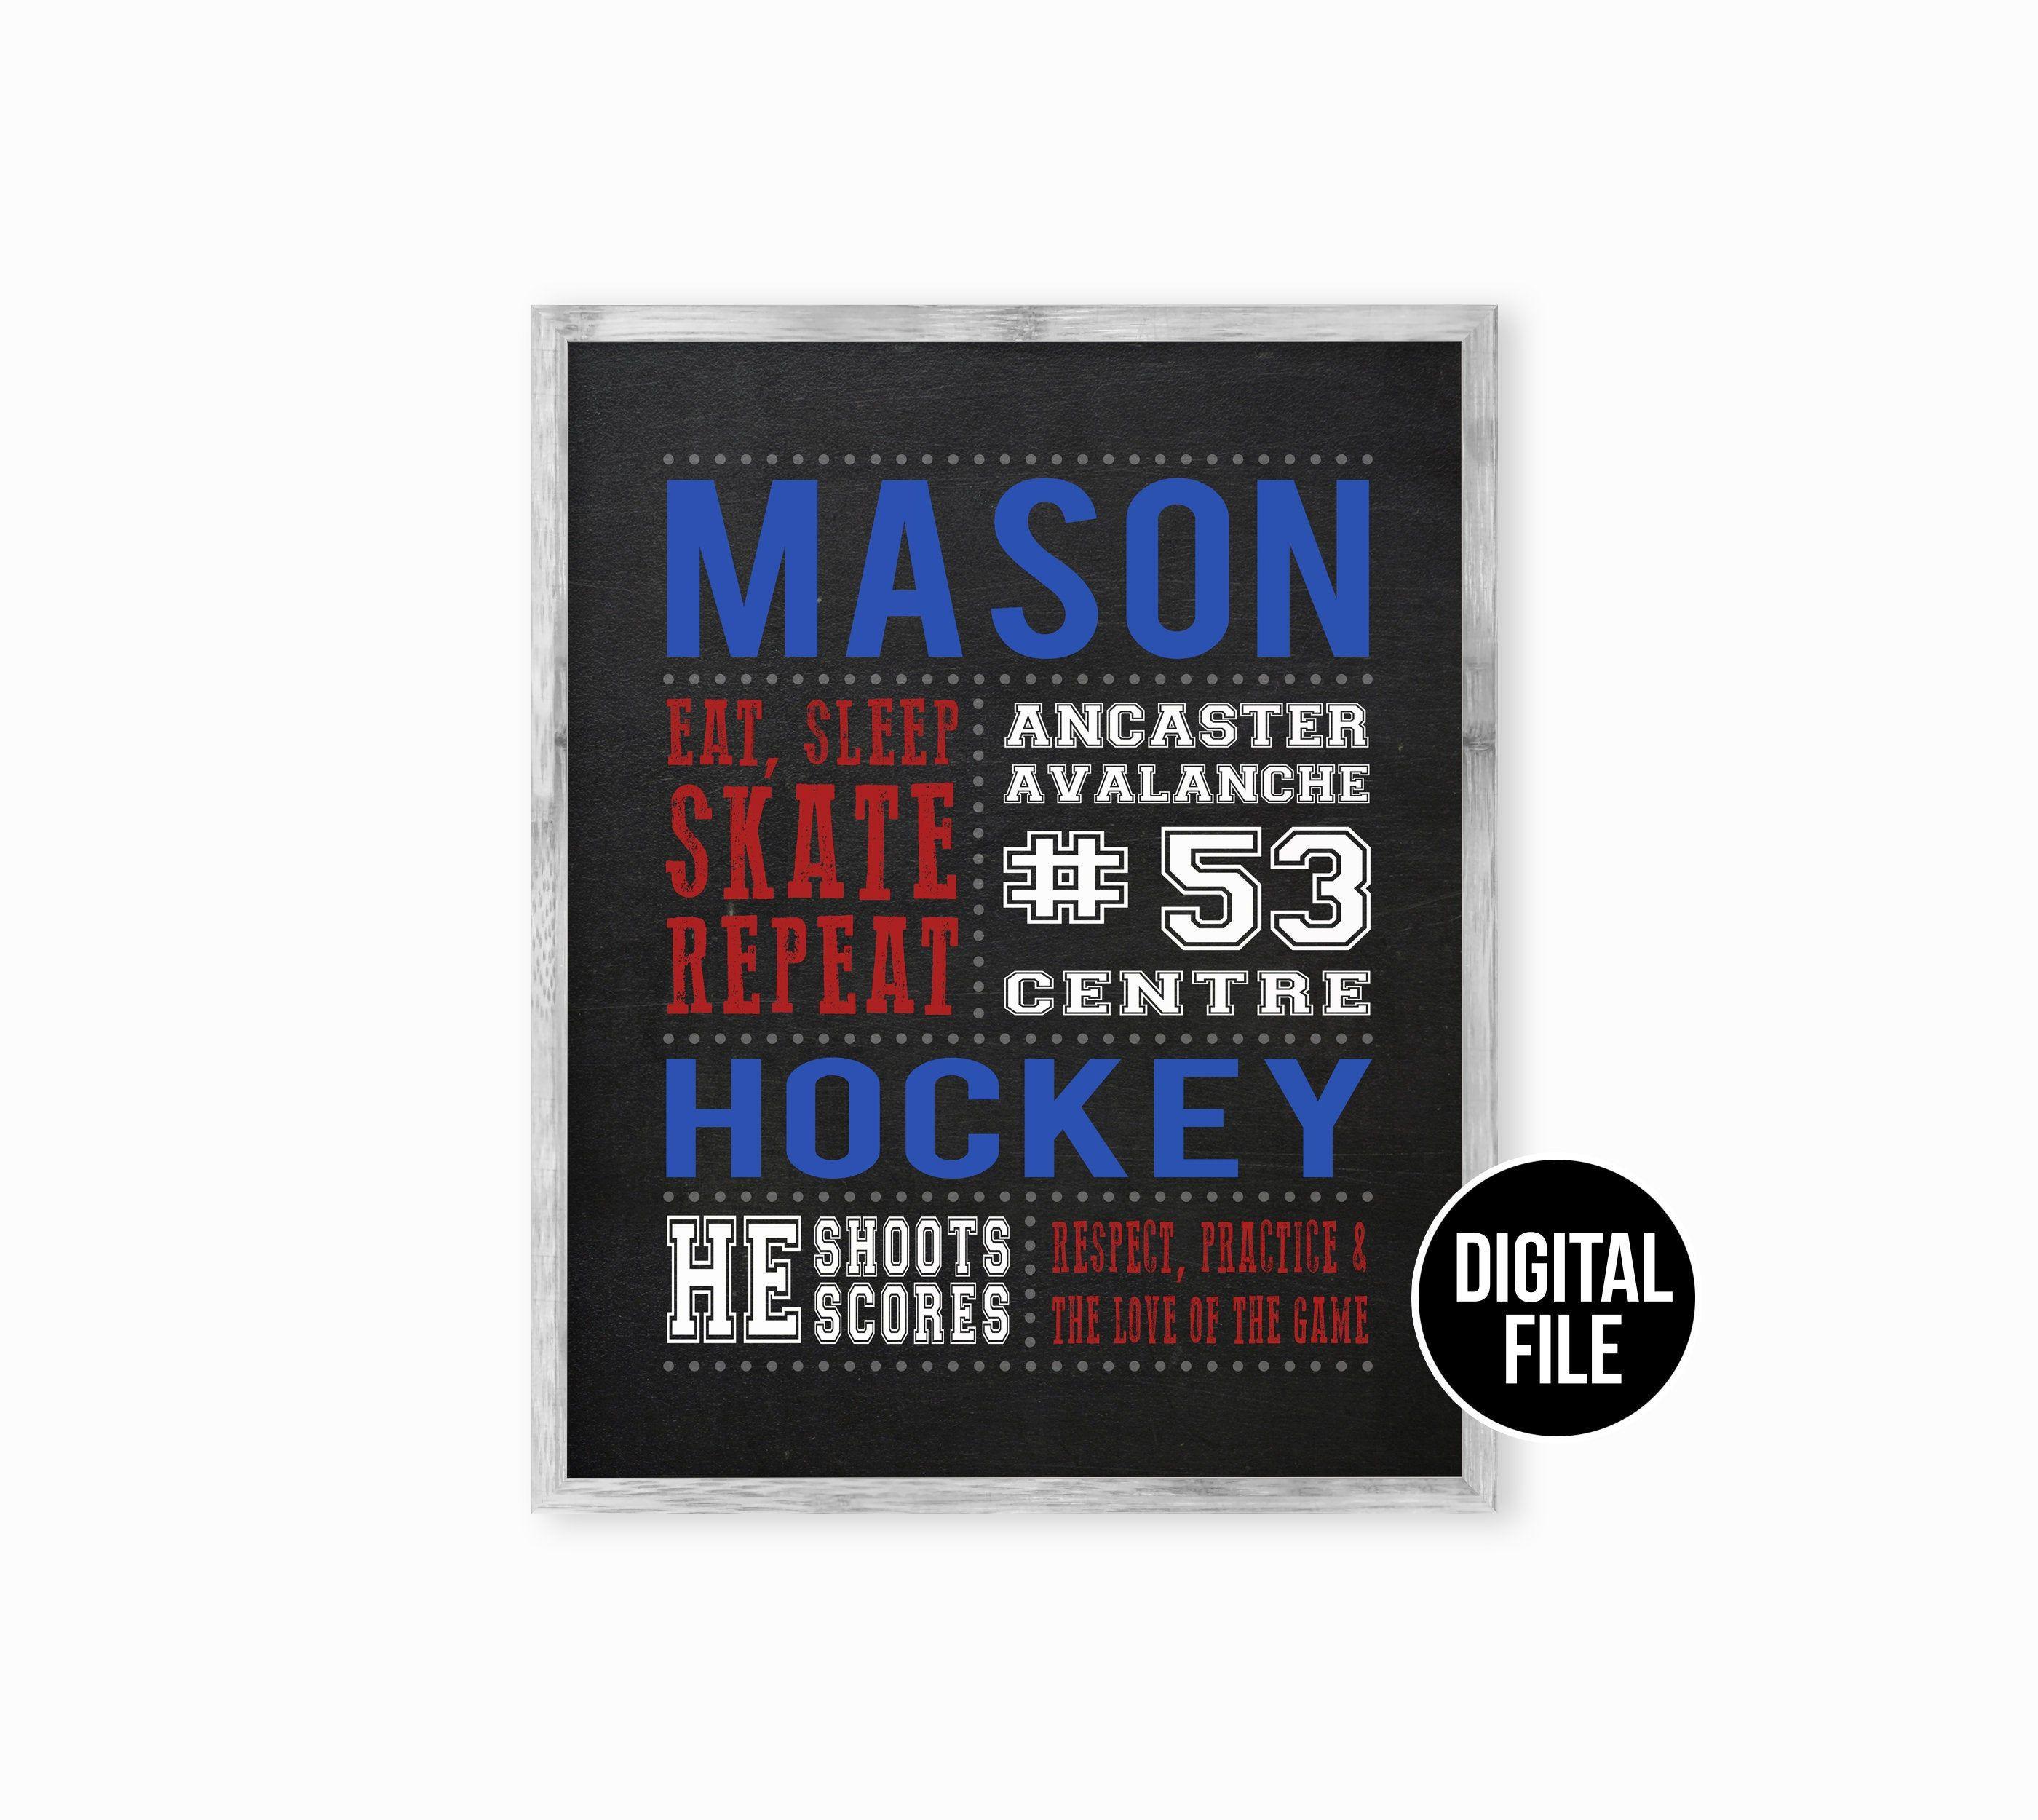 Personalized Hockey Gifts Hockey Coach Gift Hockey Decor Etsy In 2020 Personalized Hockey Gifts Hockey Gifts Hockey Decor